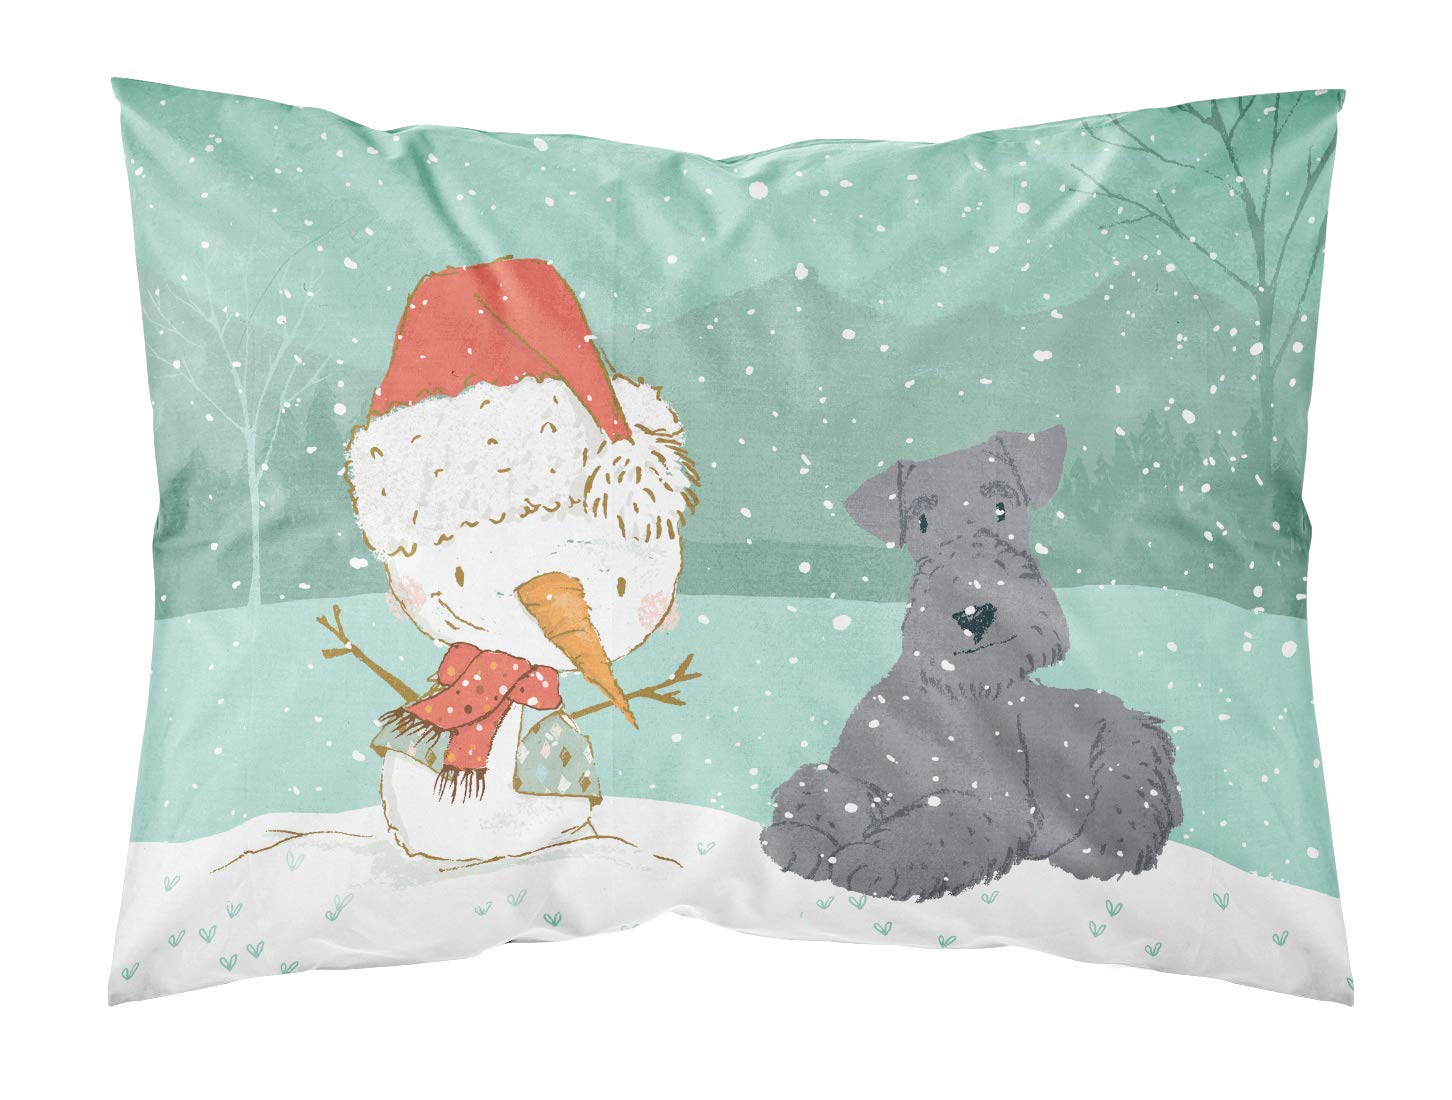 Carolines Treasures Lakeland Terrier Snowman Christmas Fabric Standard Pillowcase Multicolor